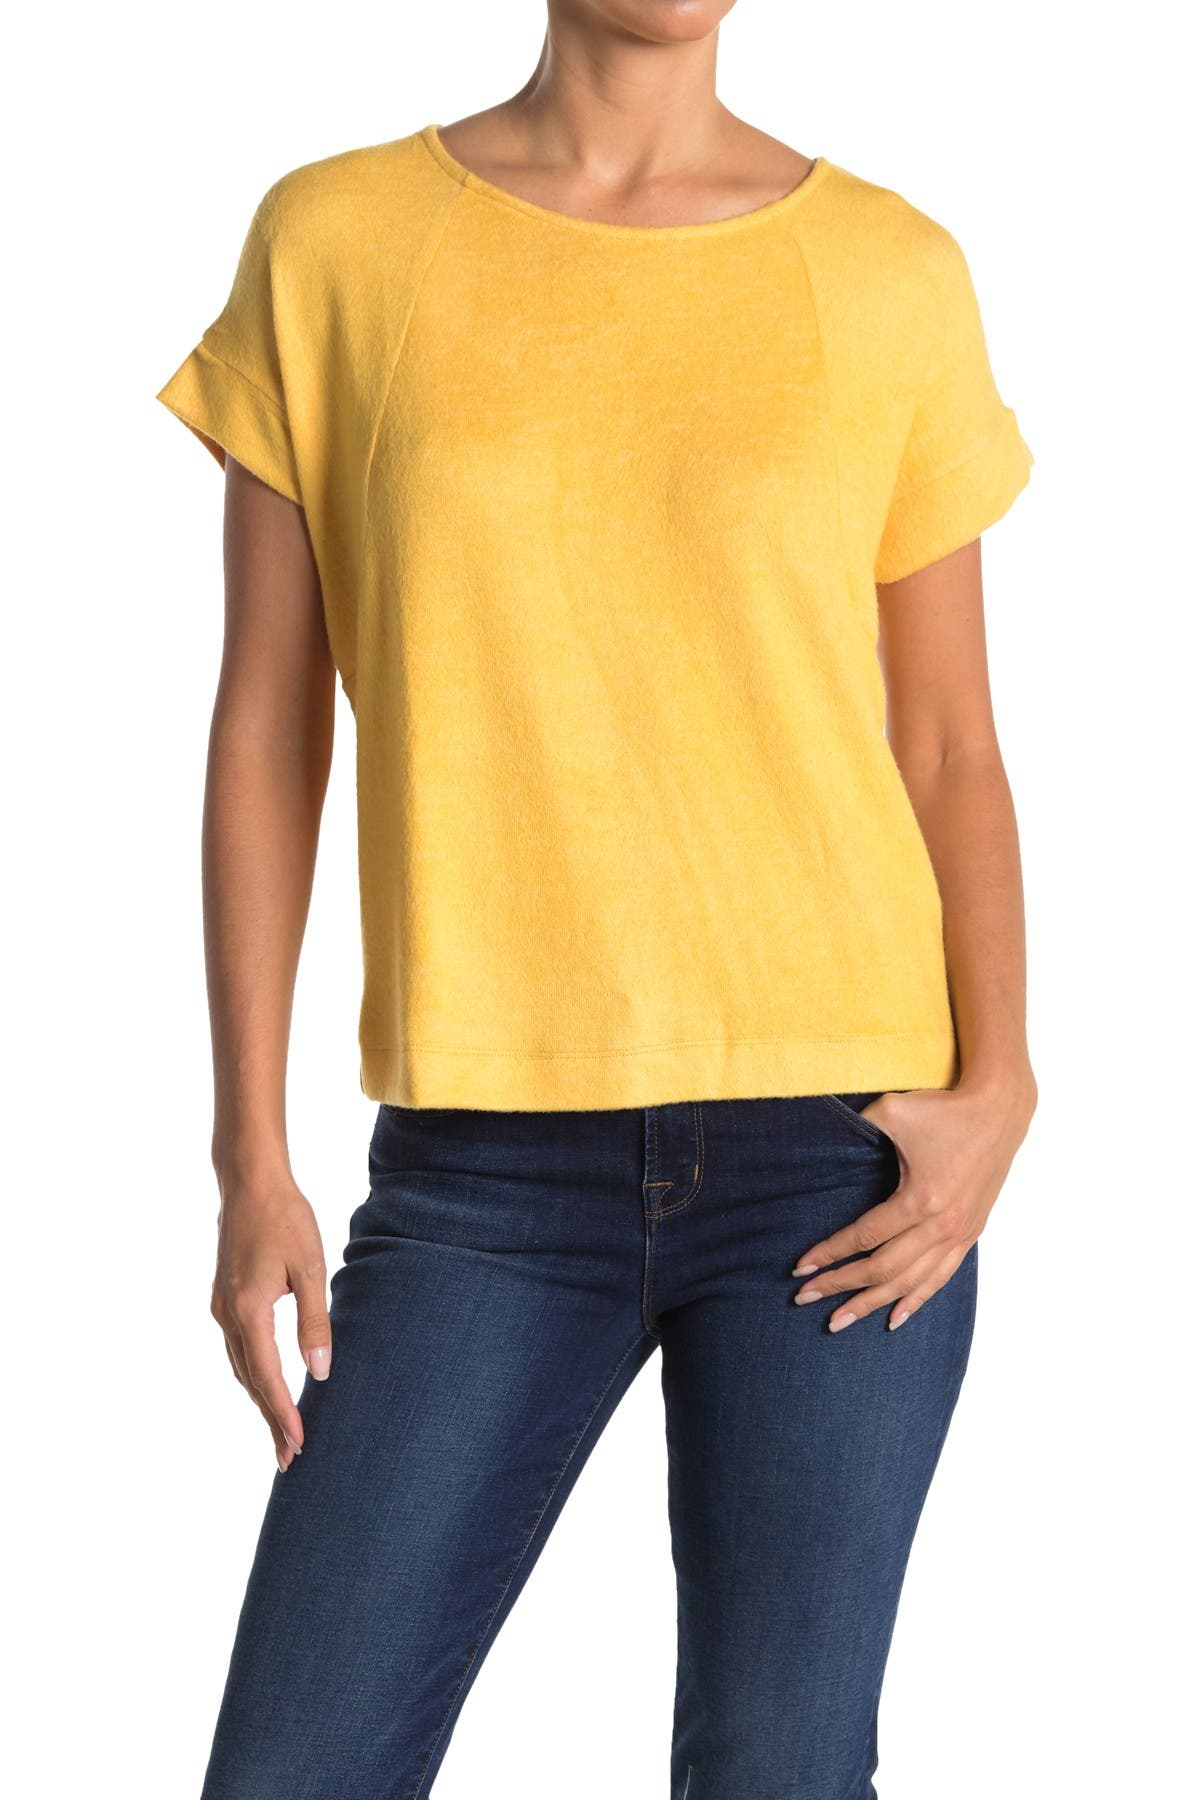 Image of Bobeau Hacci Raglan Sleeve Sweater Top